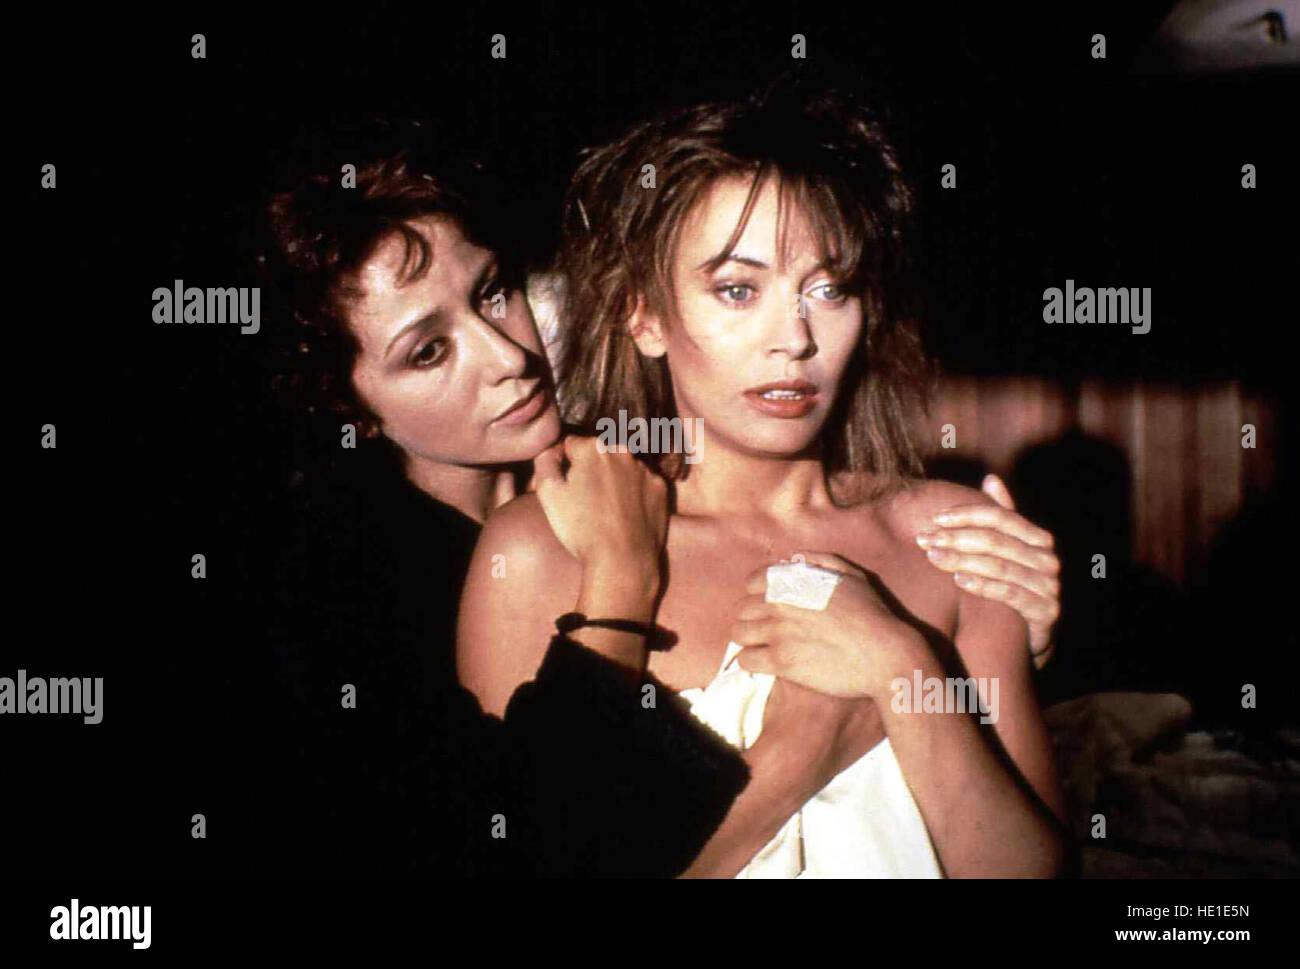 Nomads - Tod aus dem Nichts, USA 1986 Director: John McTiernan Actors/Stars: Lesley-Anne Down, Pierce Brosnan, Anna Maria Monticelli Stock Photo